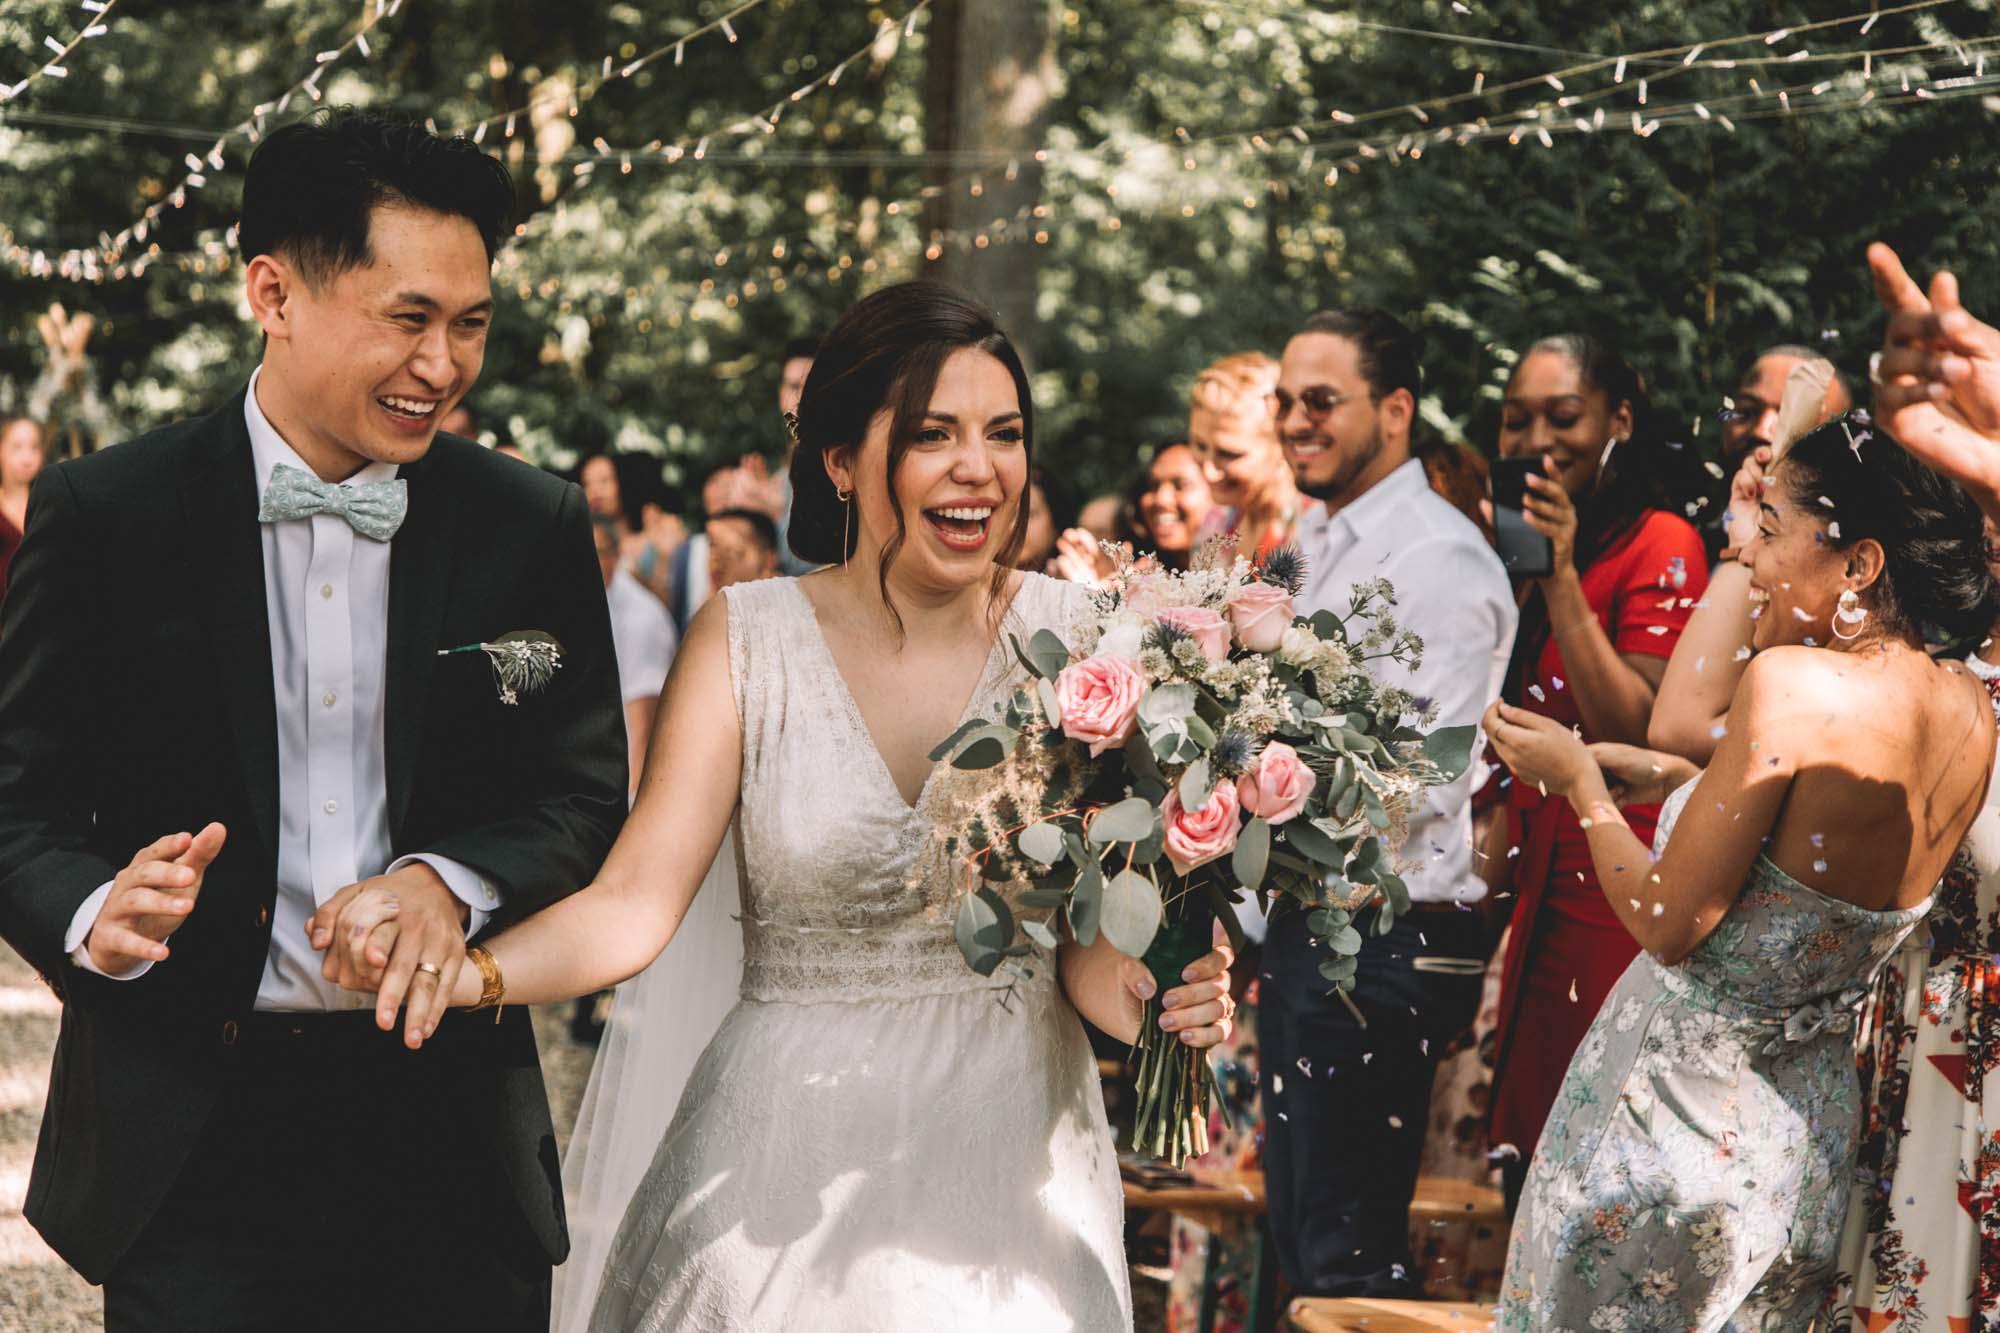 SOPHIA+THIBAUD_MANOIR SAINT HUBERT_PHOTOGRAPHE_MARIAGE_LES BANDITS-31